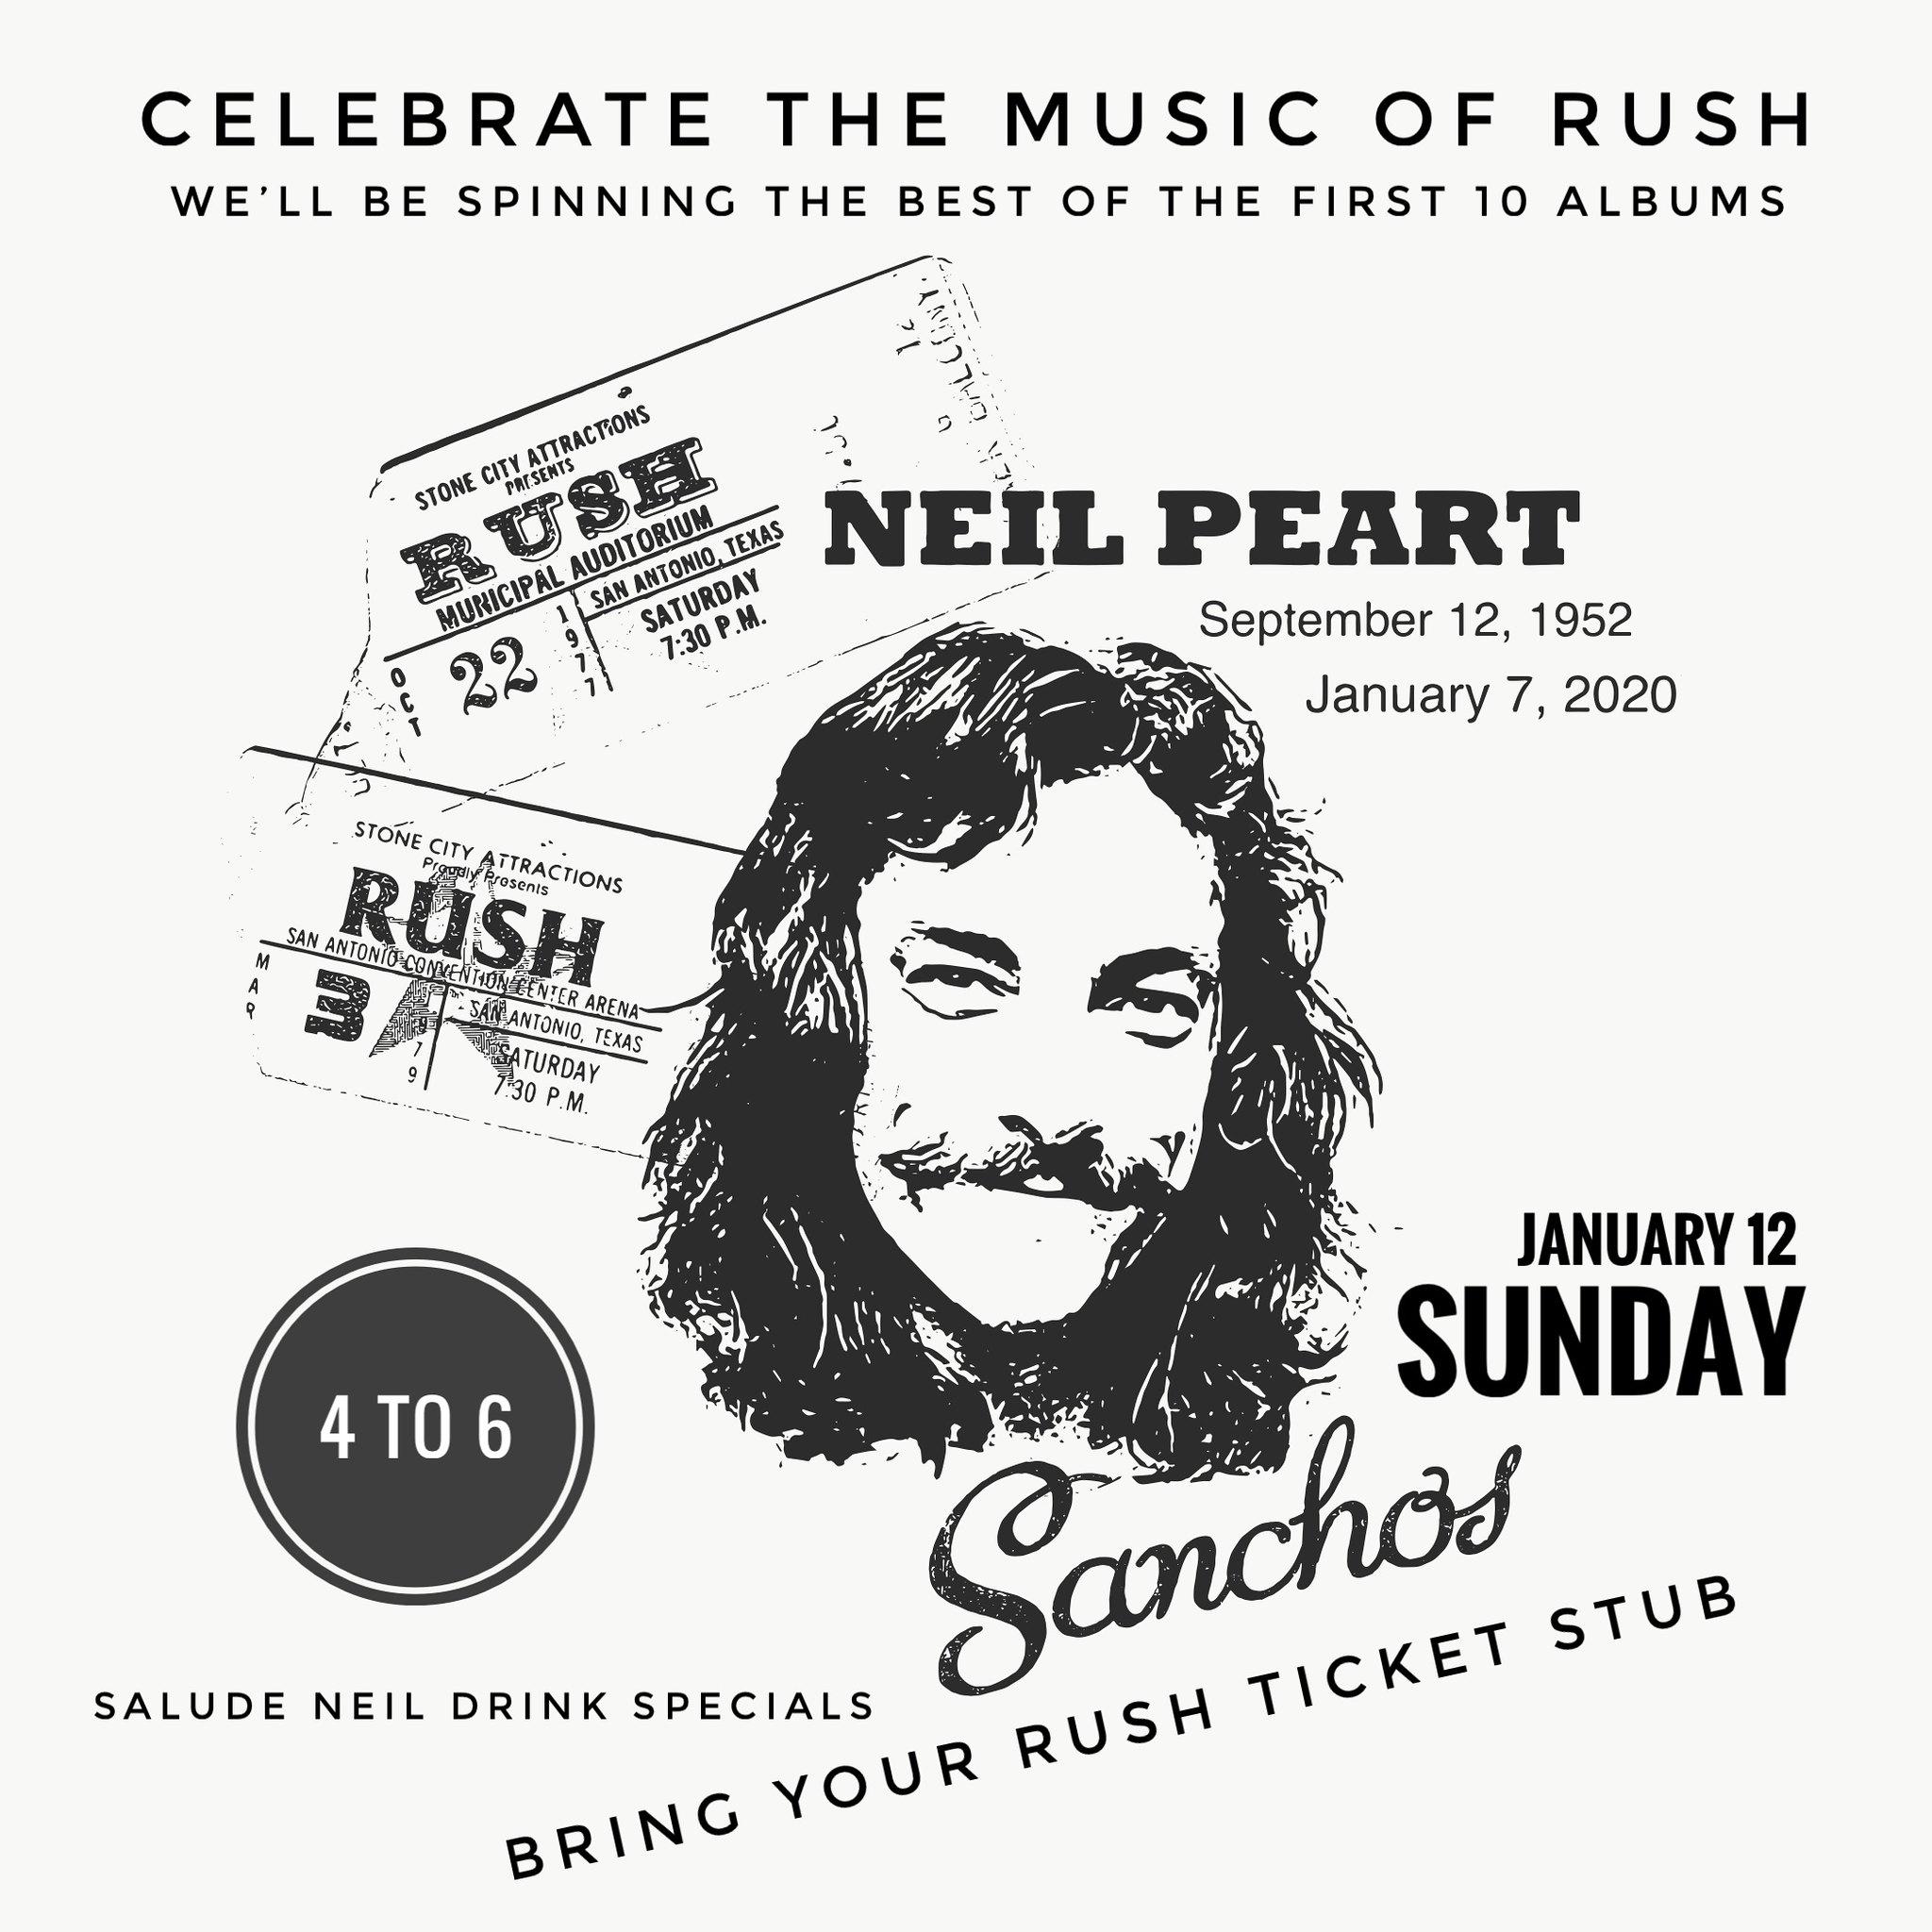 Neil Peart Tribute Celebration